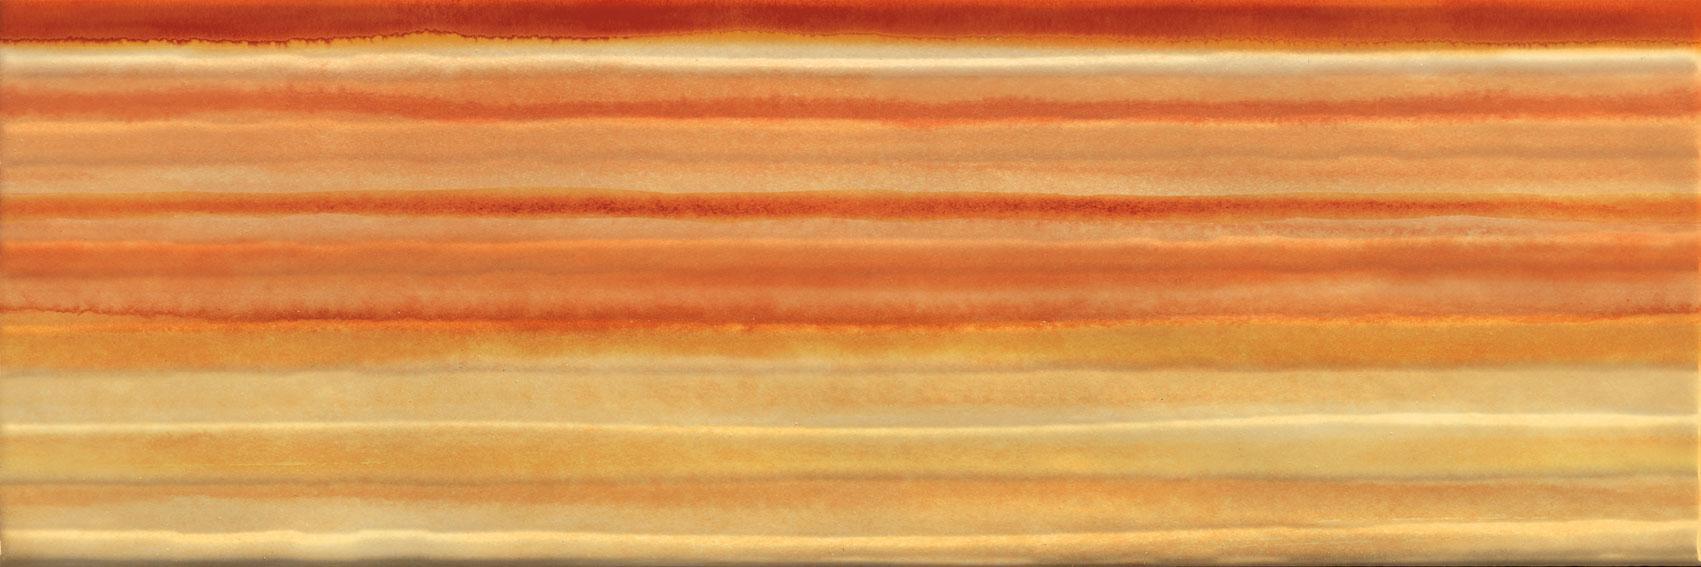 Dec. righe 20x60 Giallo / Arancio